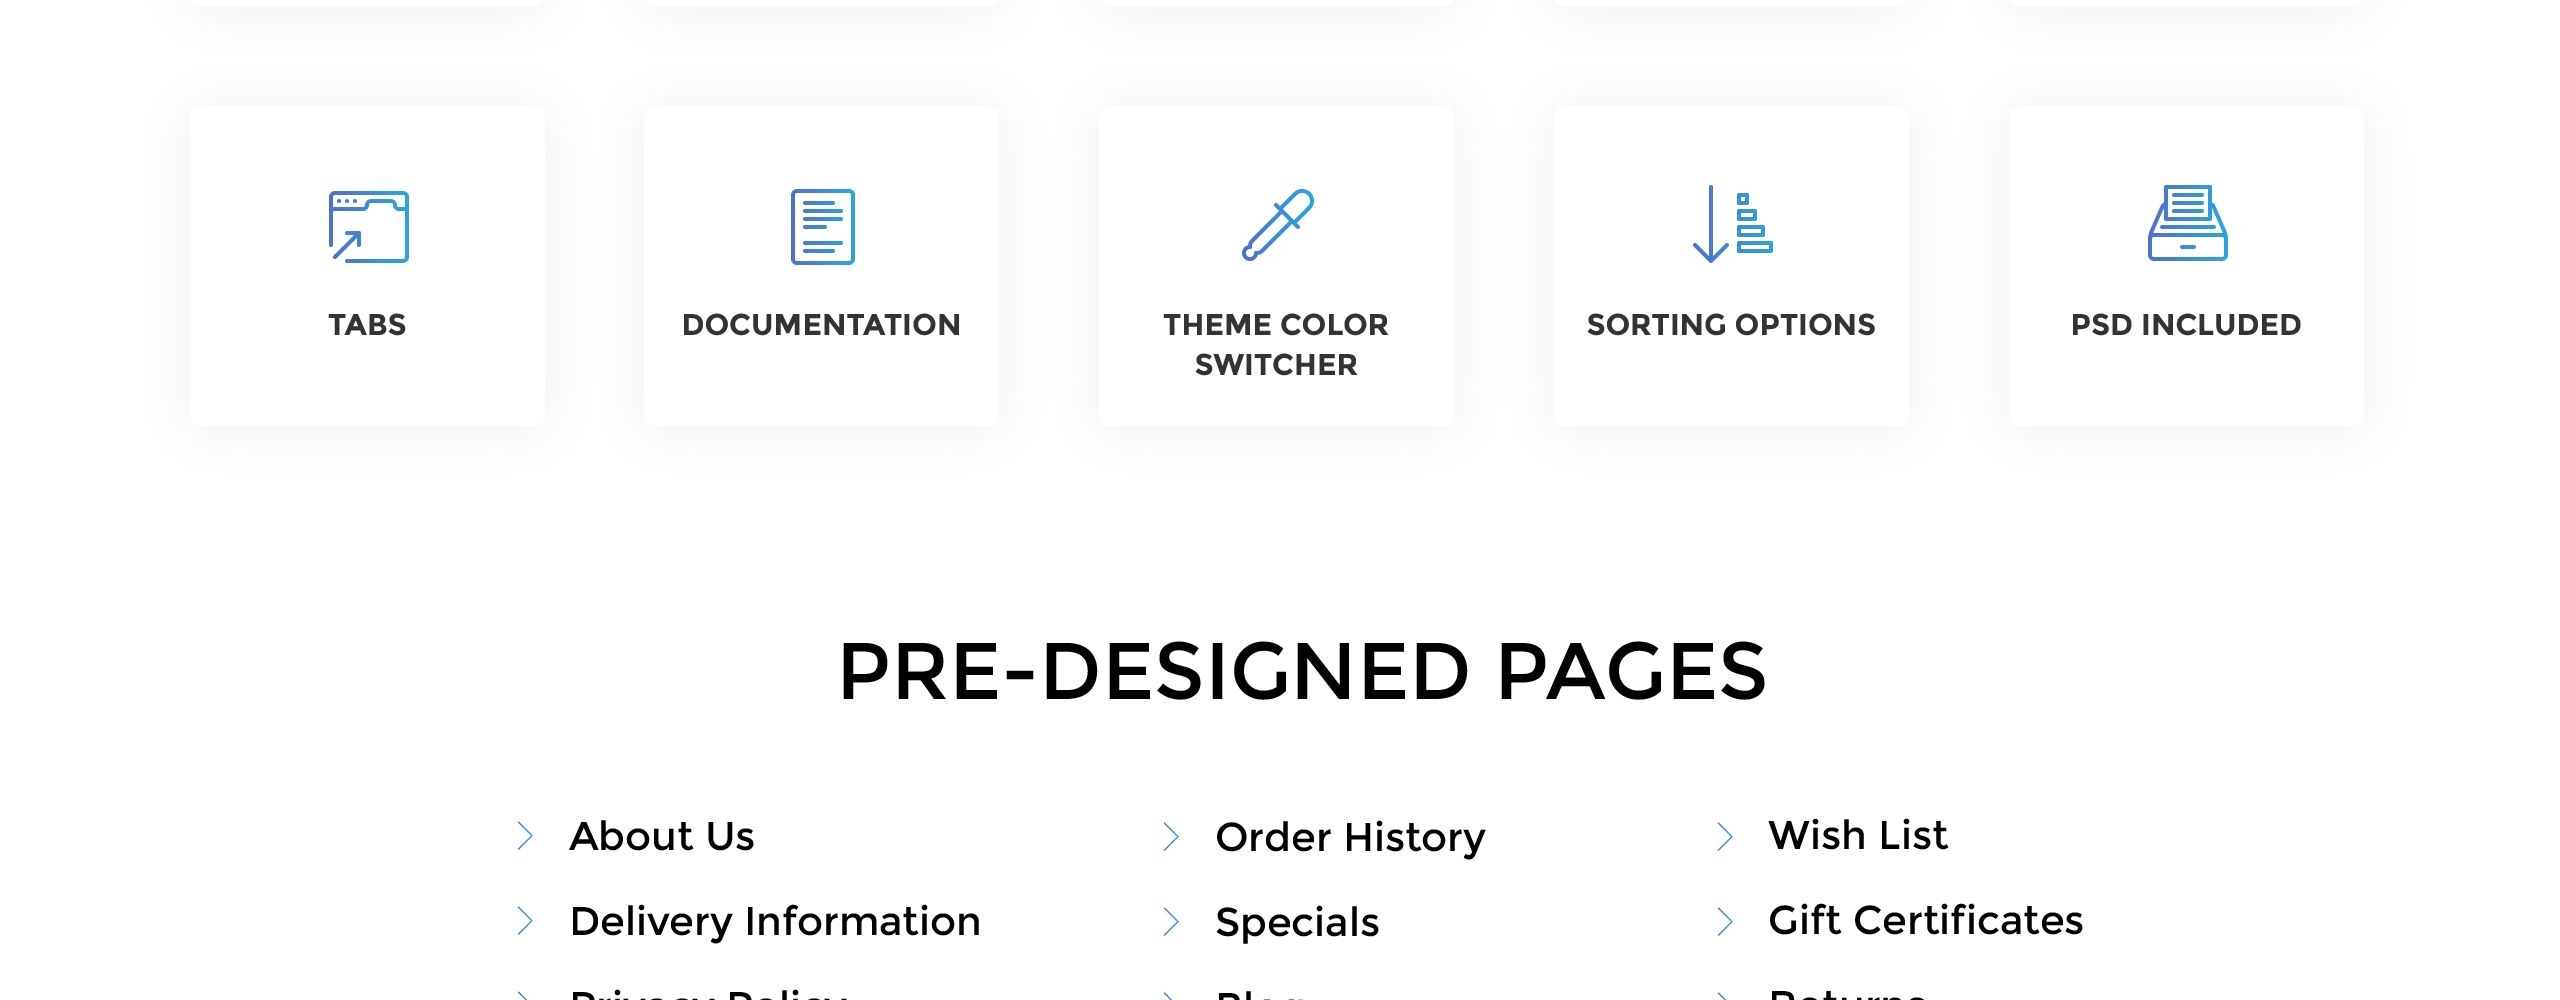 Woof Simple Pet Supplies Online Shop Opencart Template 74102 Opencart Templates Kids Fashion Stores Opencart